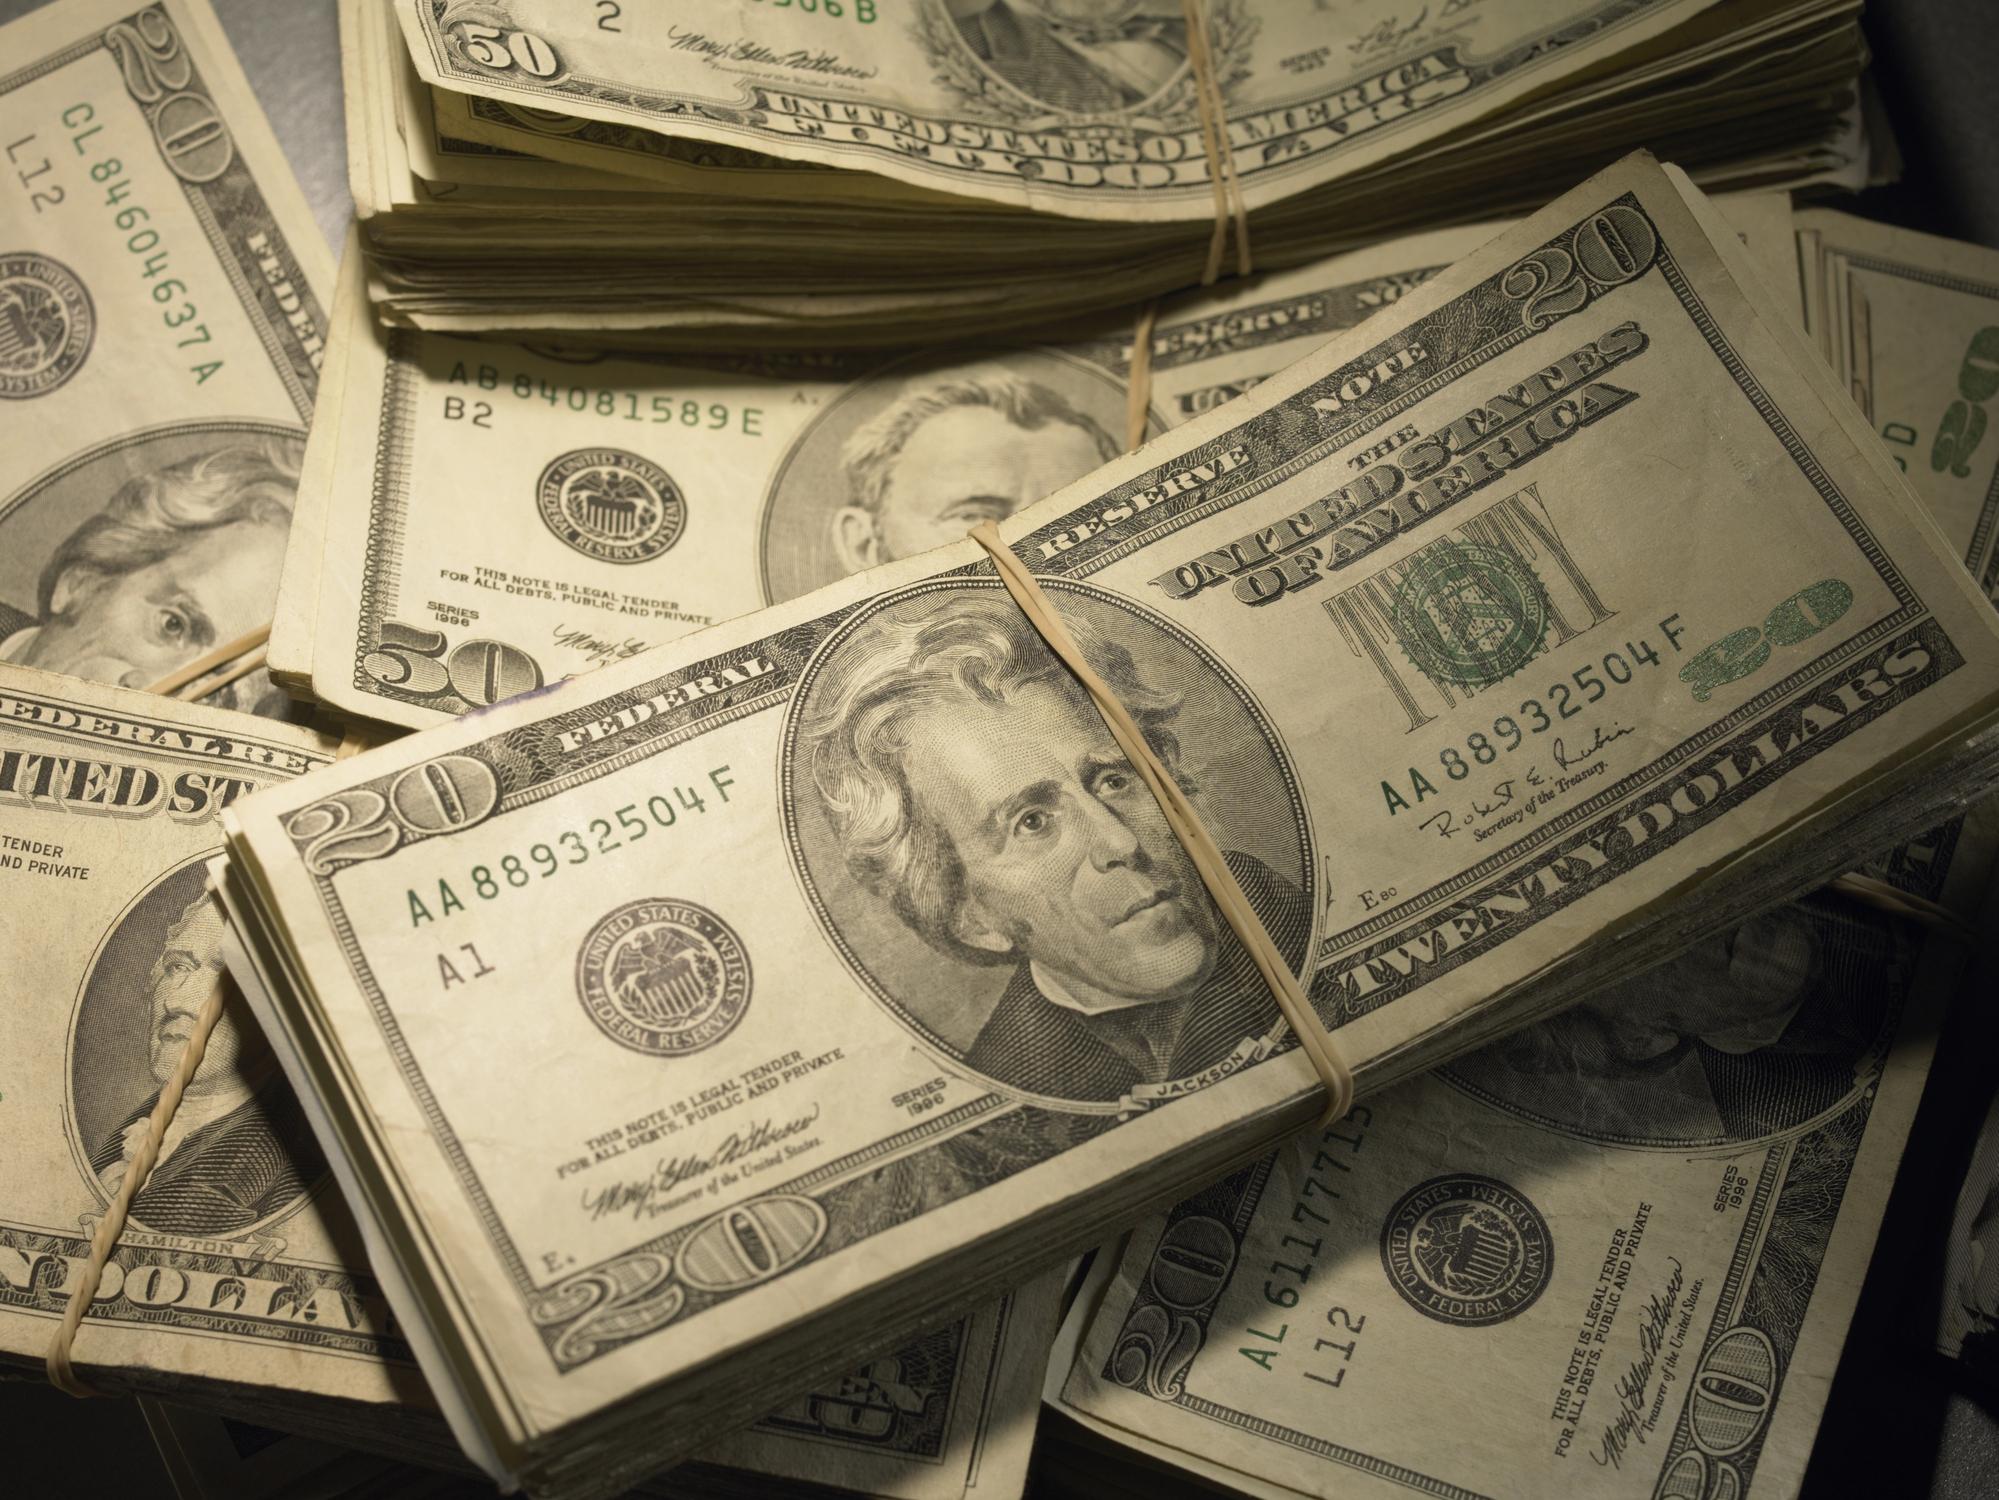 Bundles of high-denomination U.S. currency.